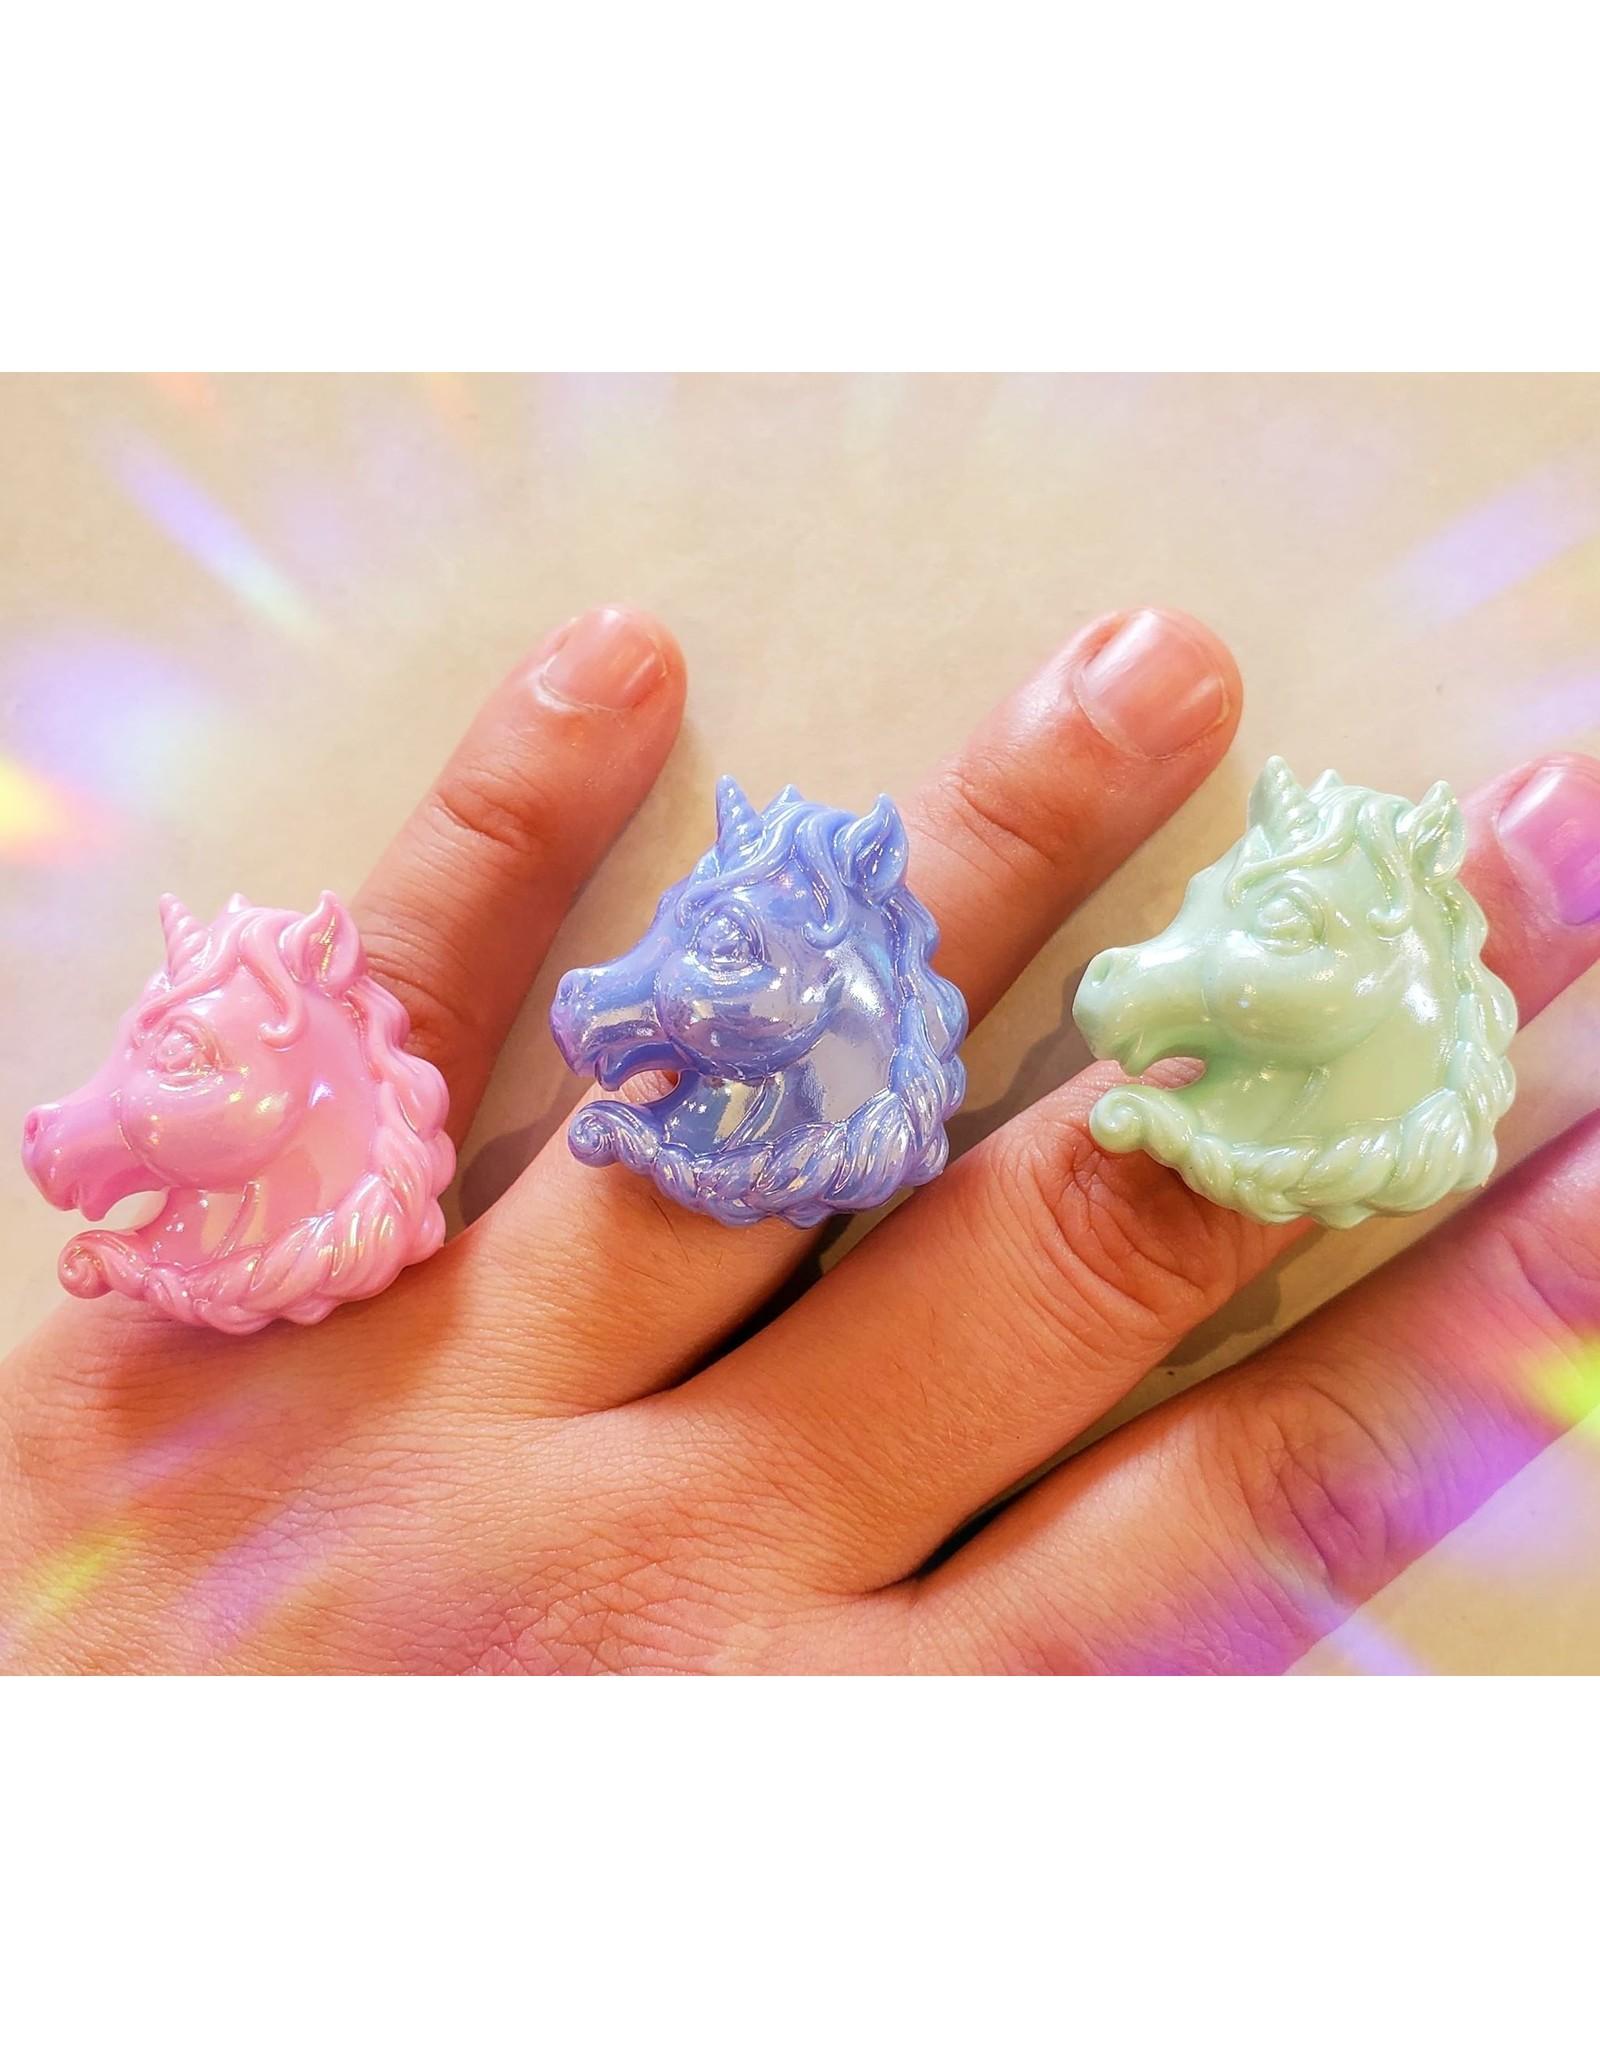 Giant Plastic Ring